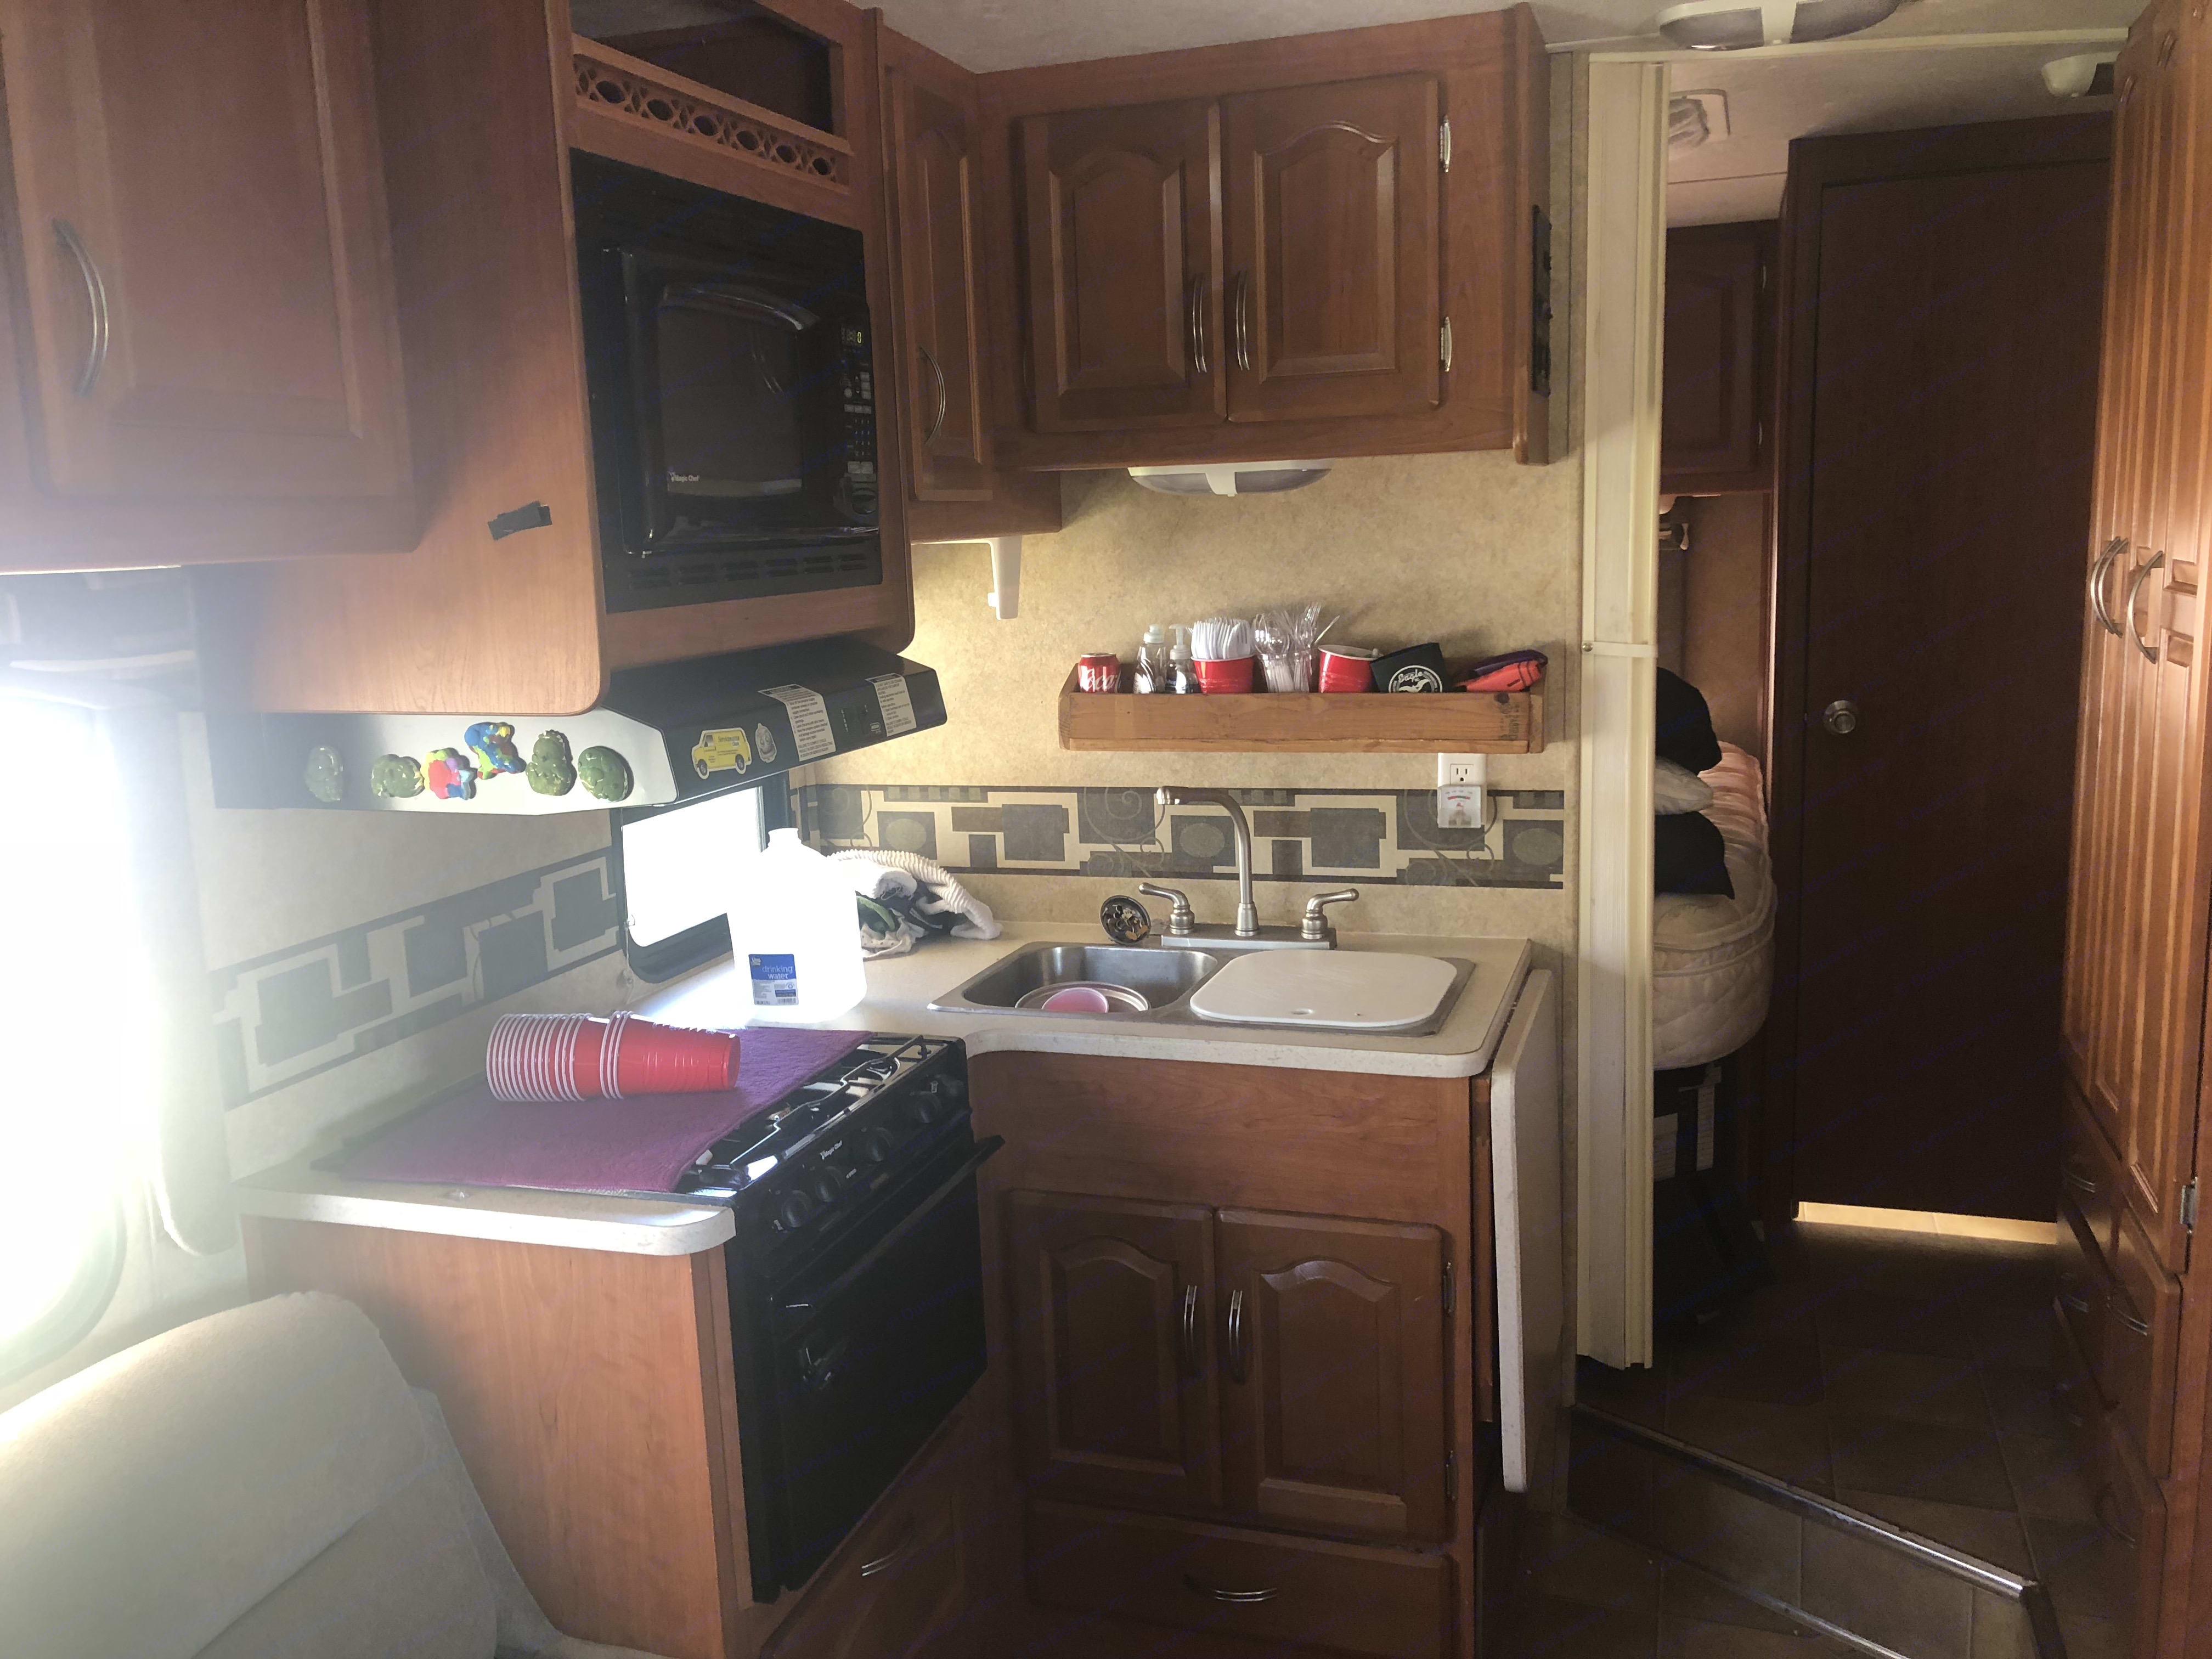 Cozy Kitchen. Forest River Sunseeker 2010